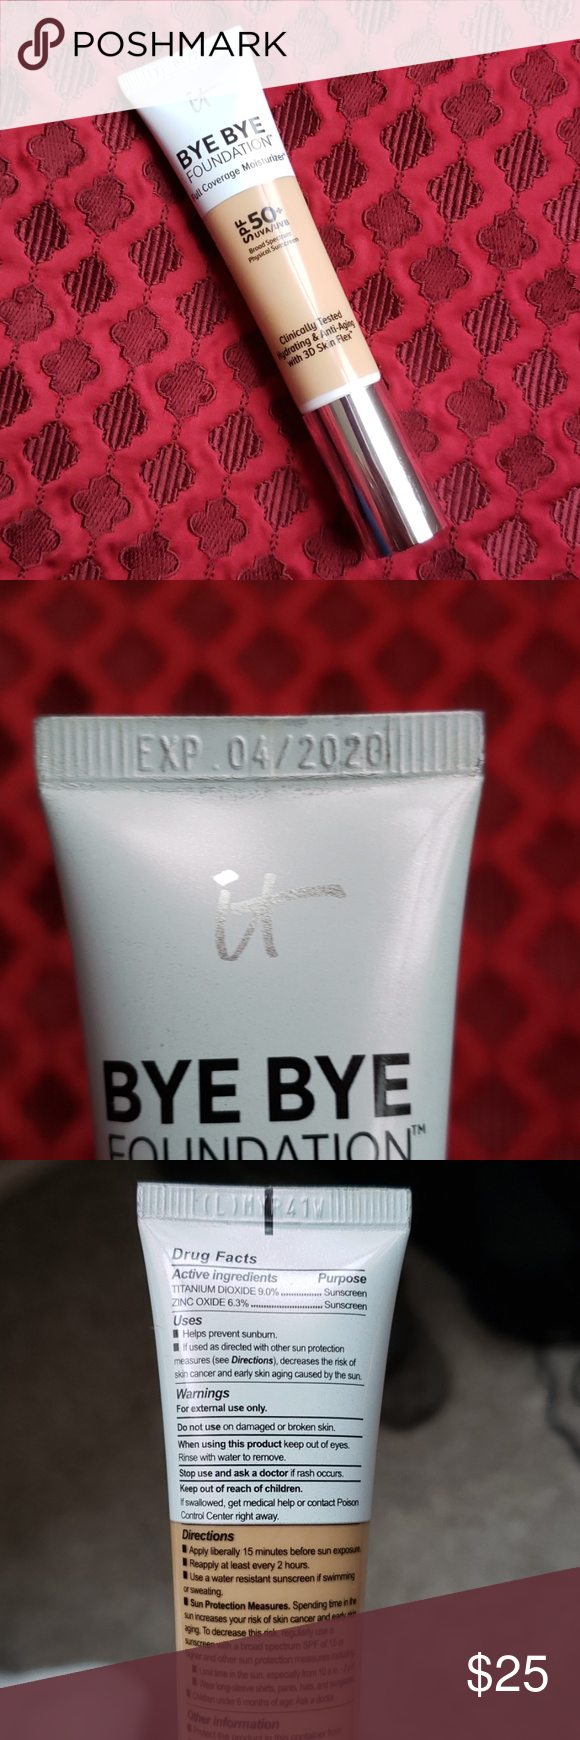 It Cosmetics Bye Bye Foundation Cosmetics, Clothes